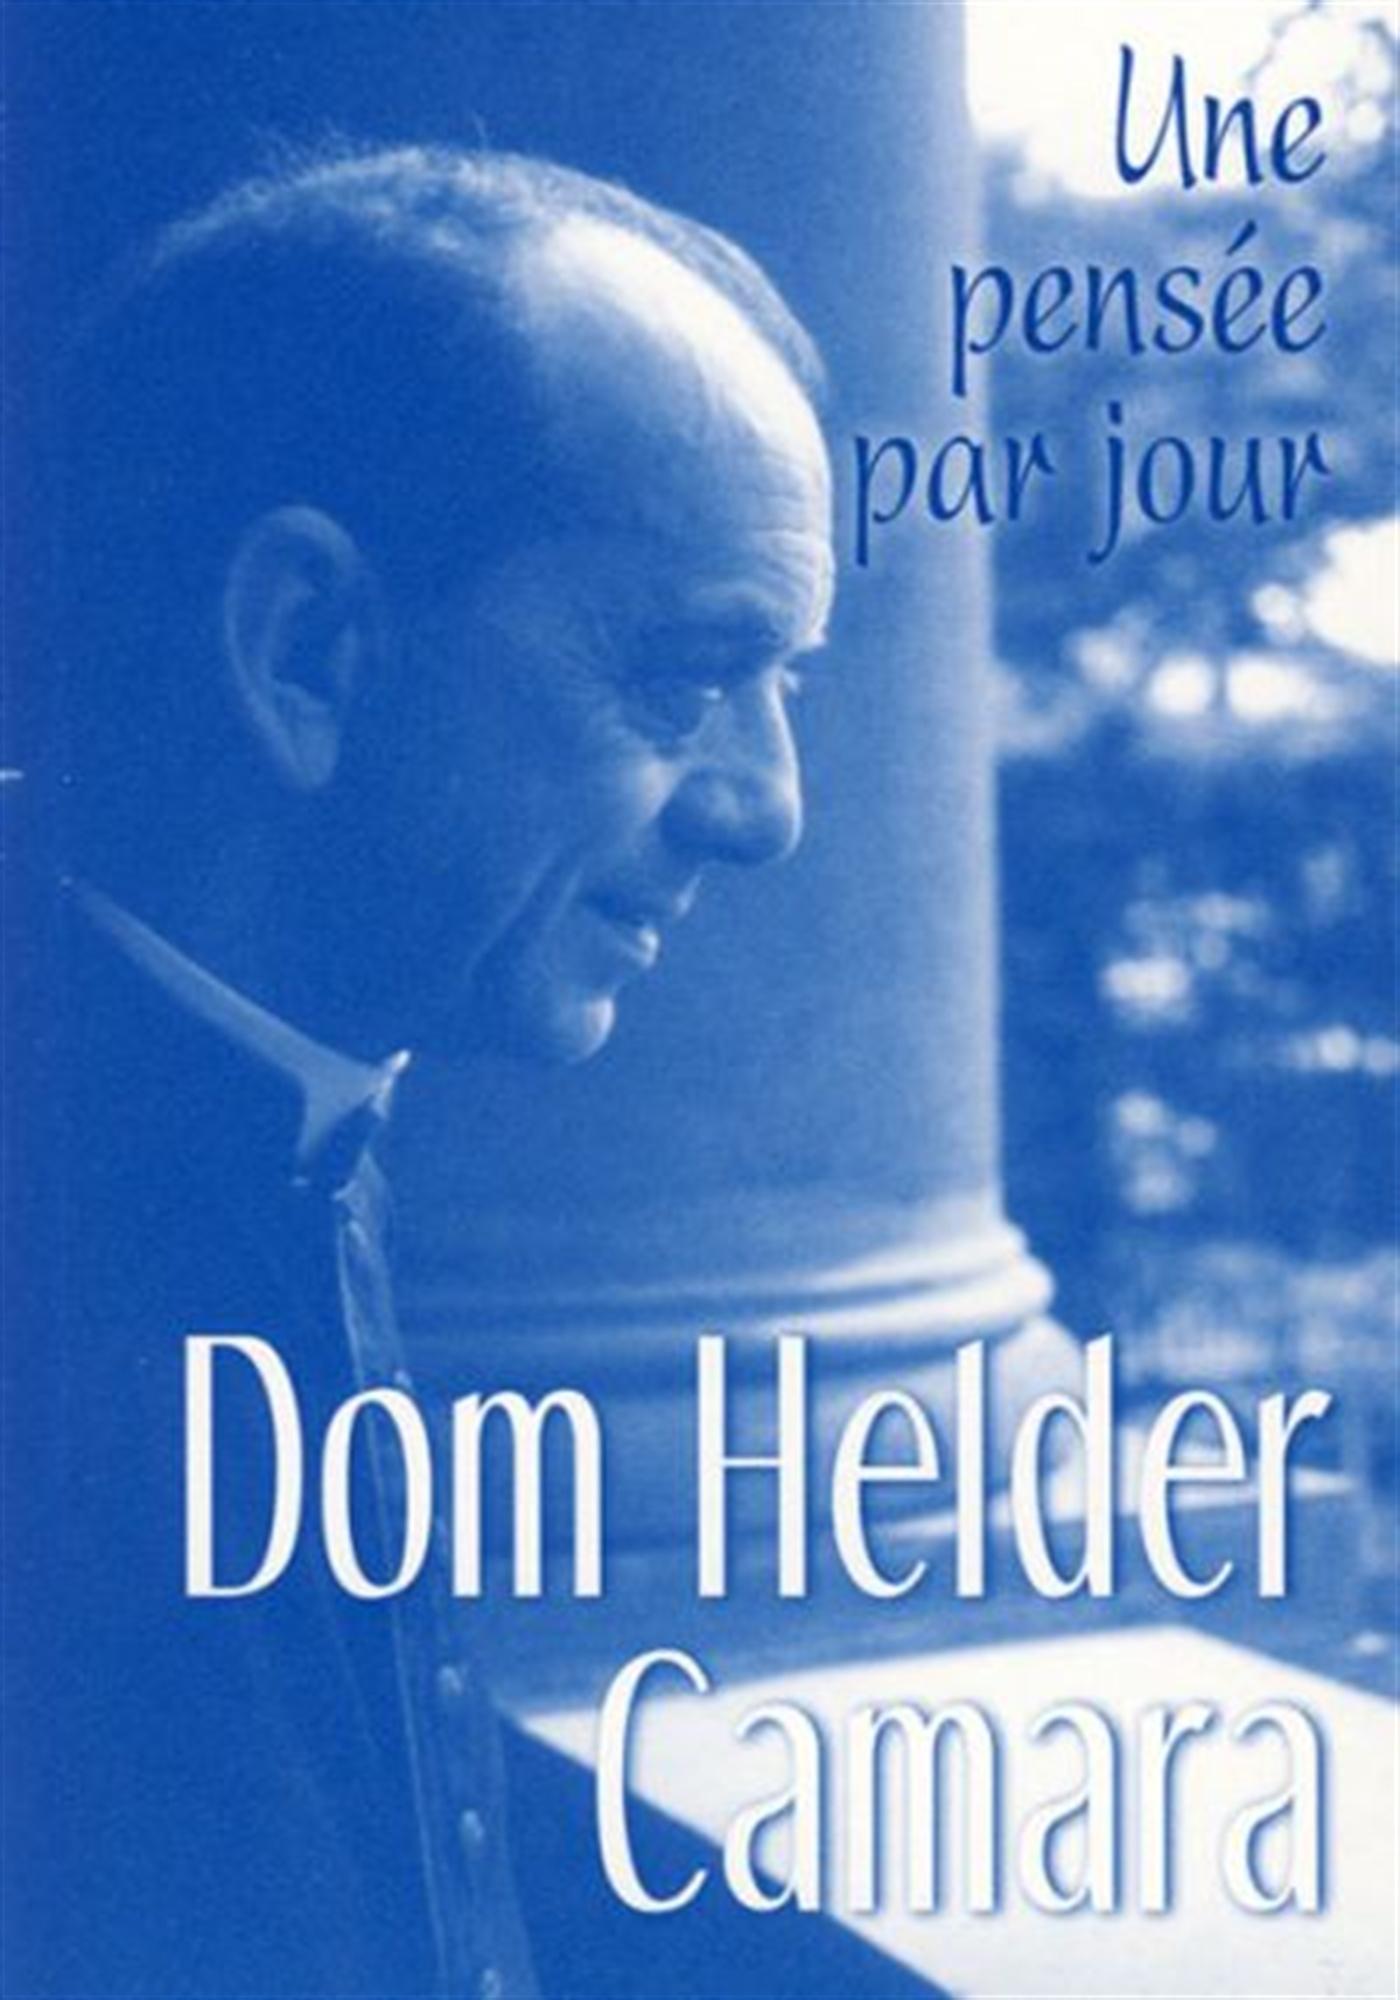 DOM HELDER CAMARA : UNE PENSEE PAR JOUR